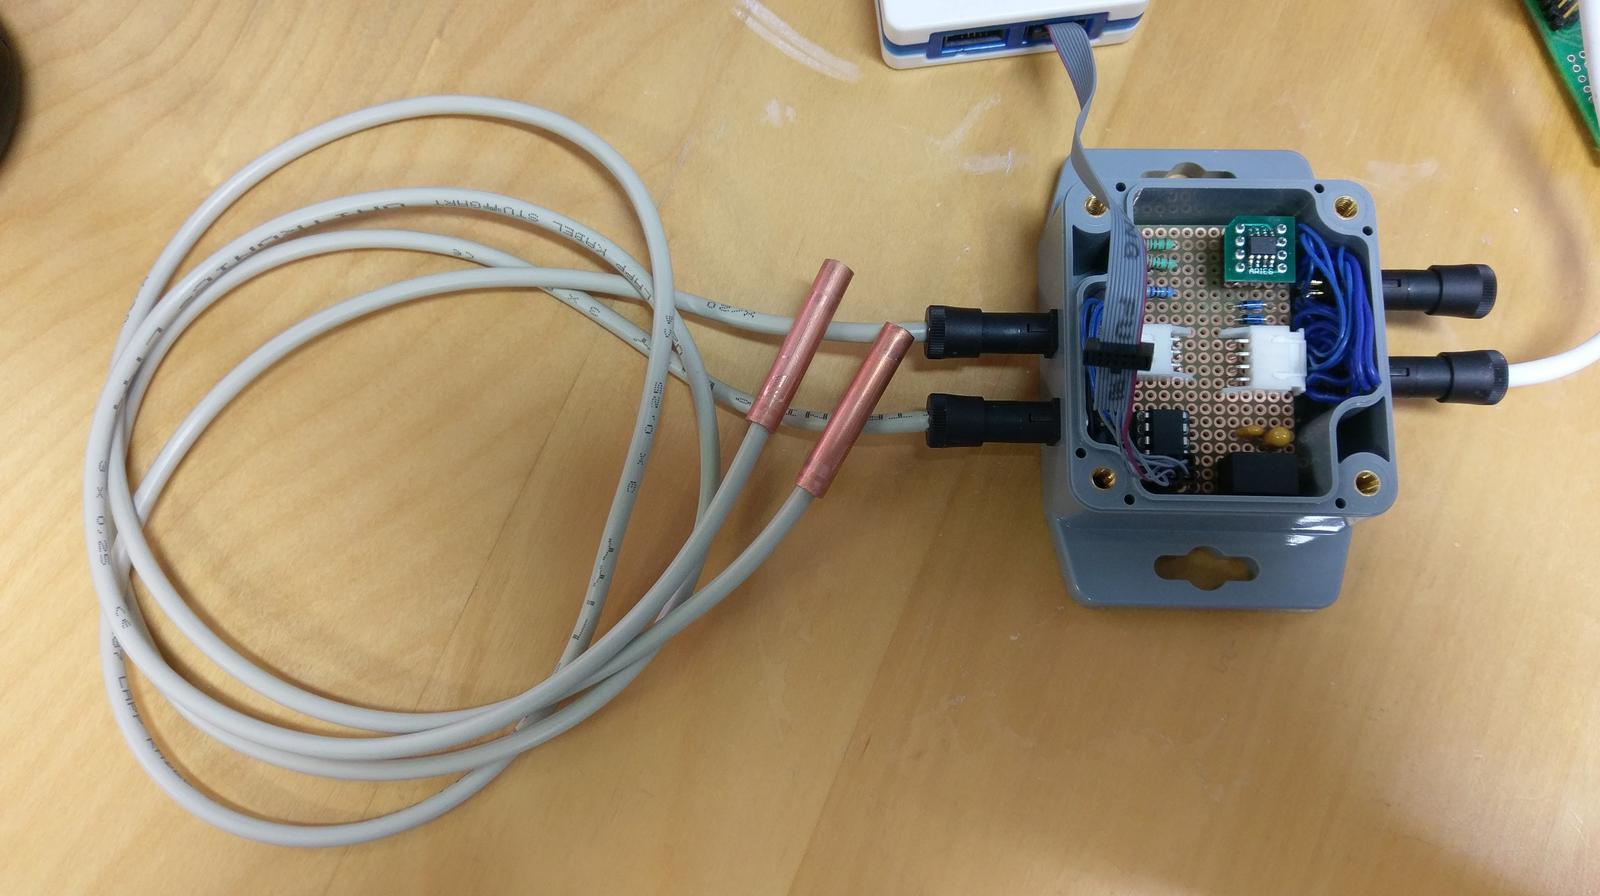 LogomatIQ - modul na meranie teploty, zatial na 2 cidla ->prototyp